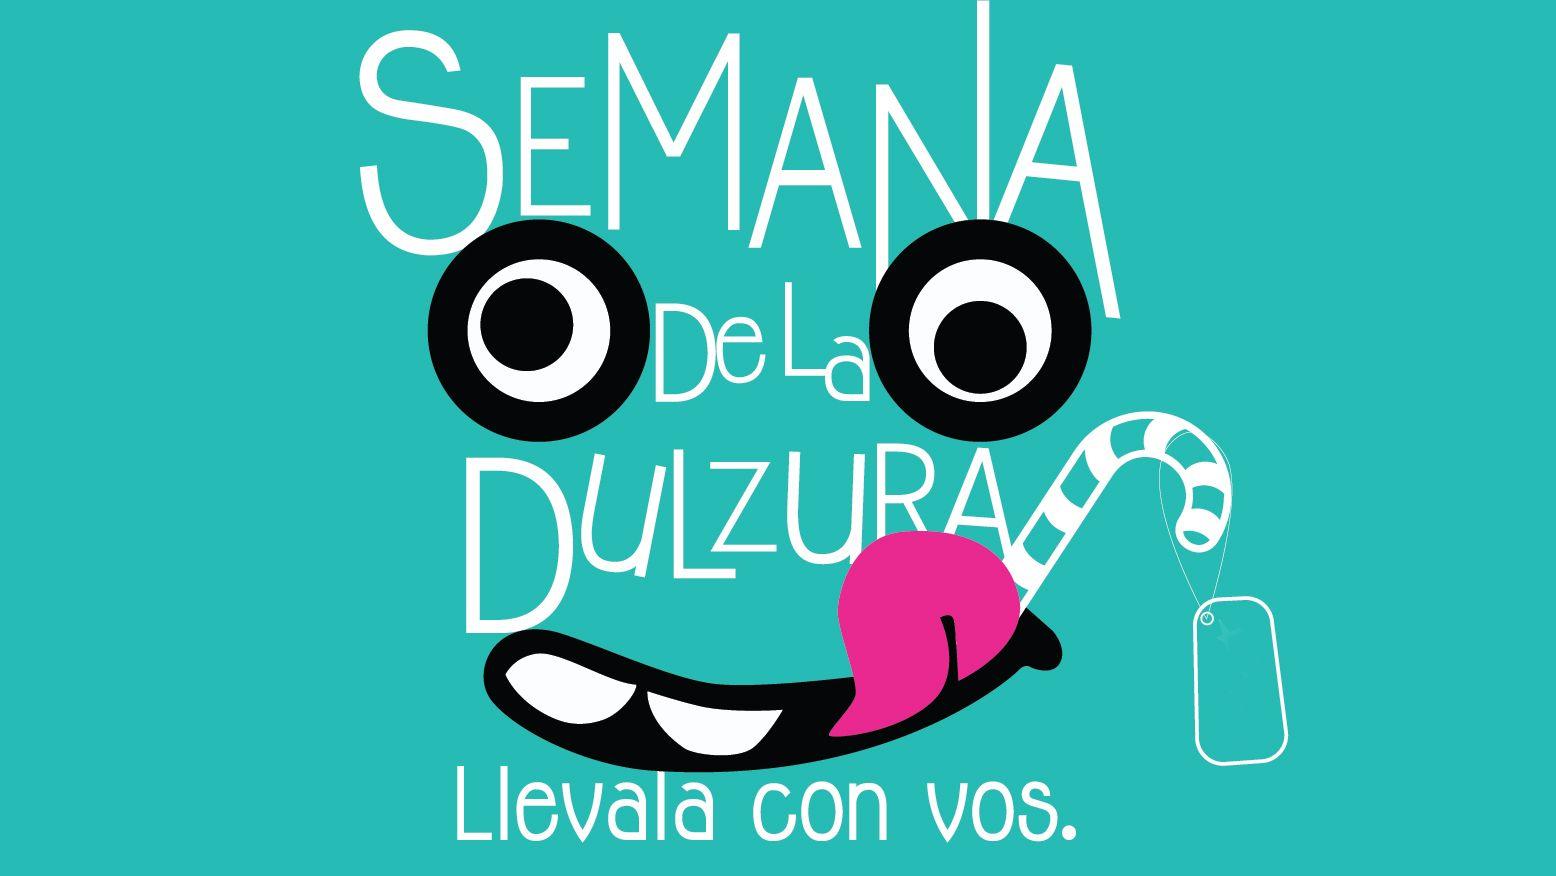 Semana De La Dulzura By Hattosz Feliz Cumpleanos 50 Anos Frases Para Vinilos Frases Dulces